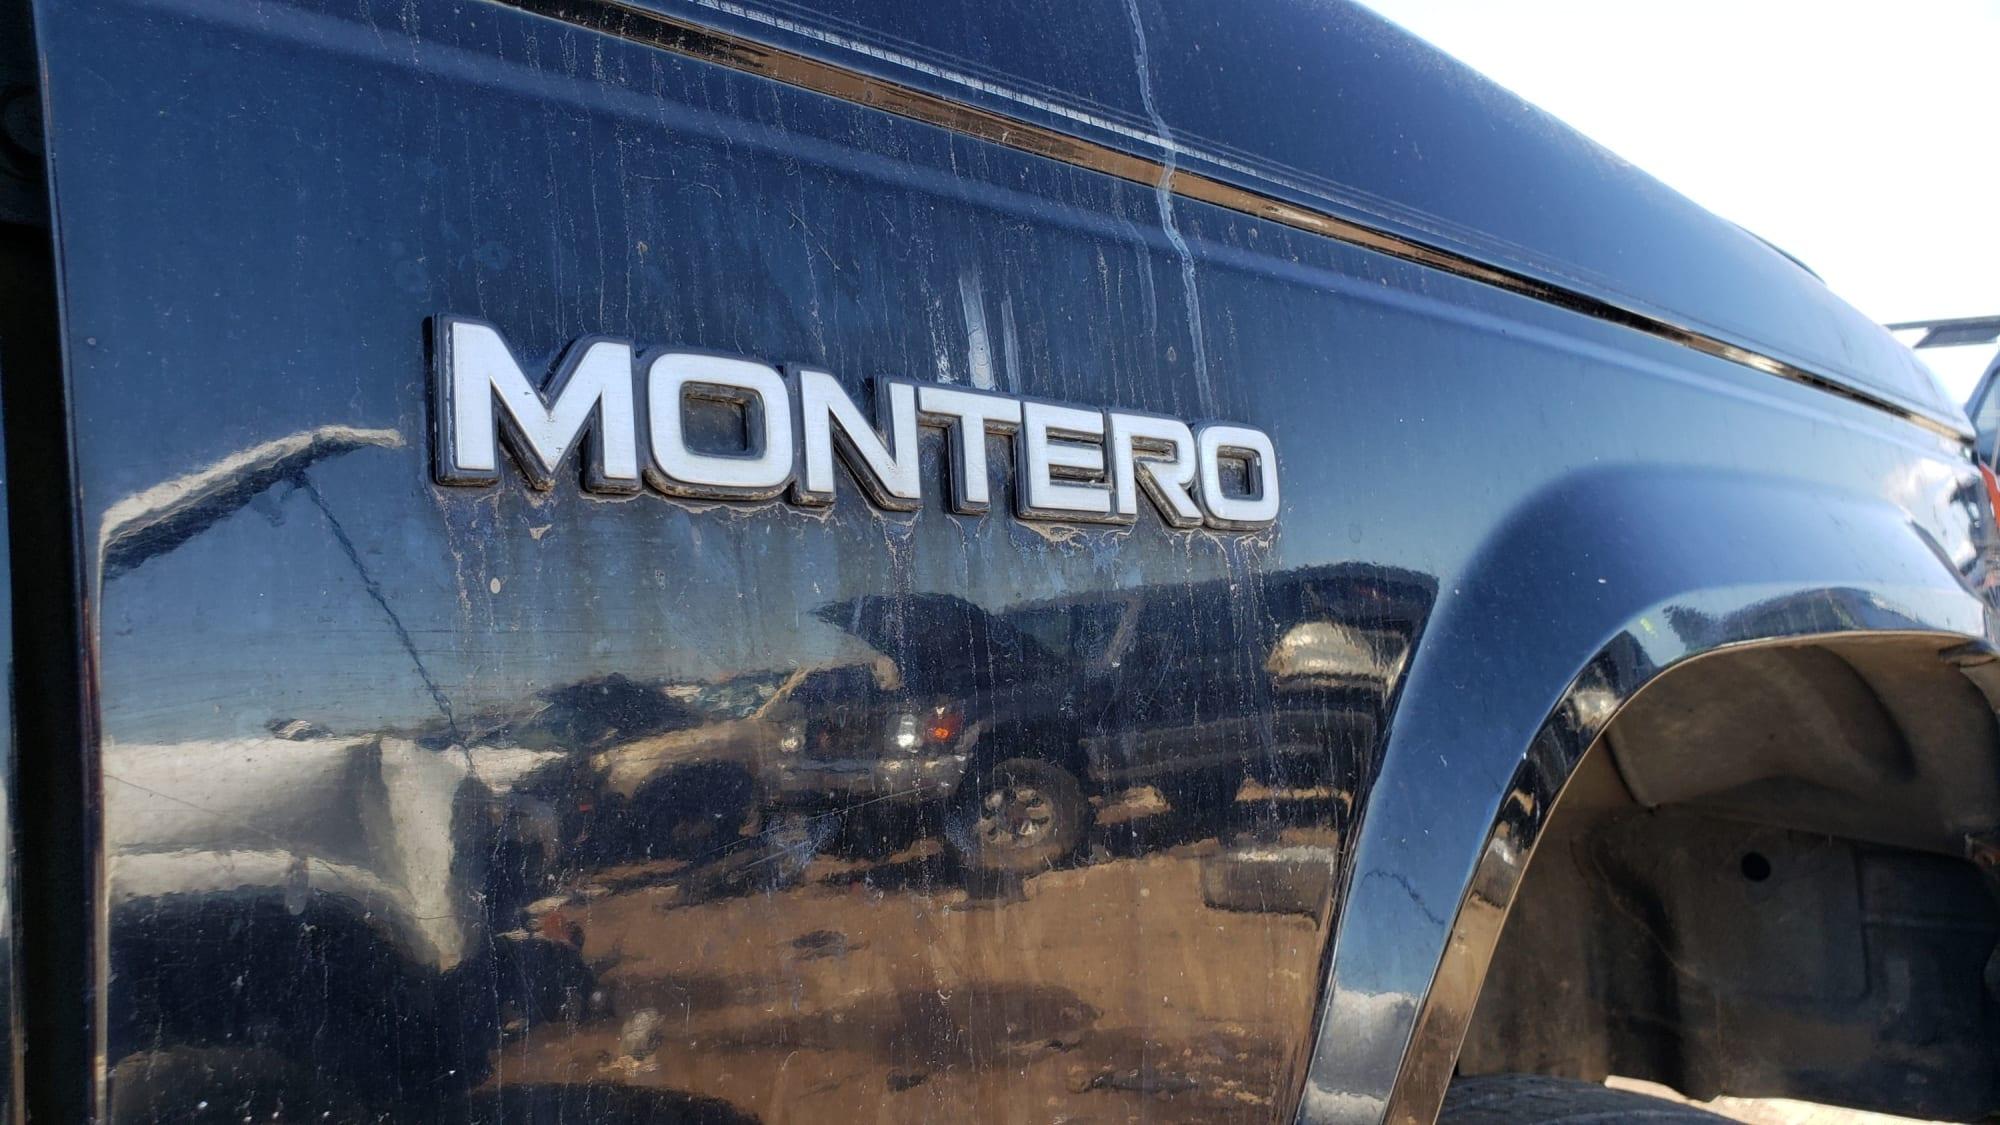 Junked 1990 Mitsubishi Montero